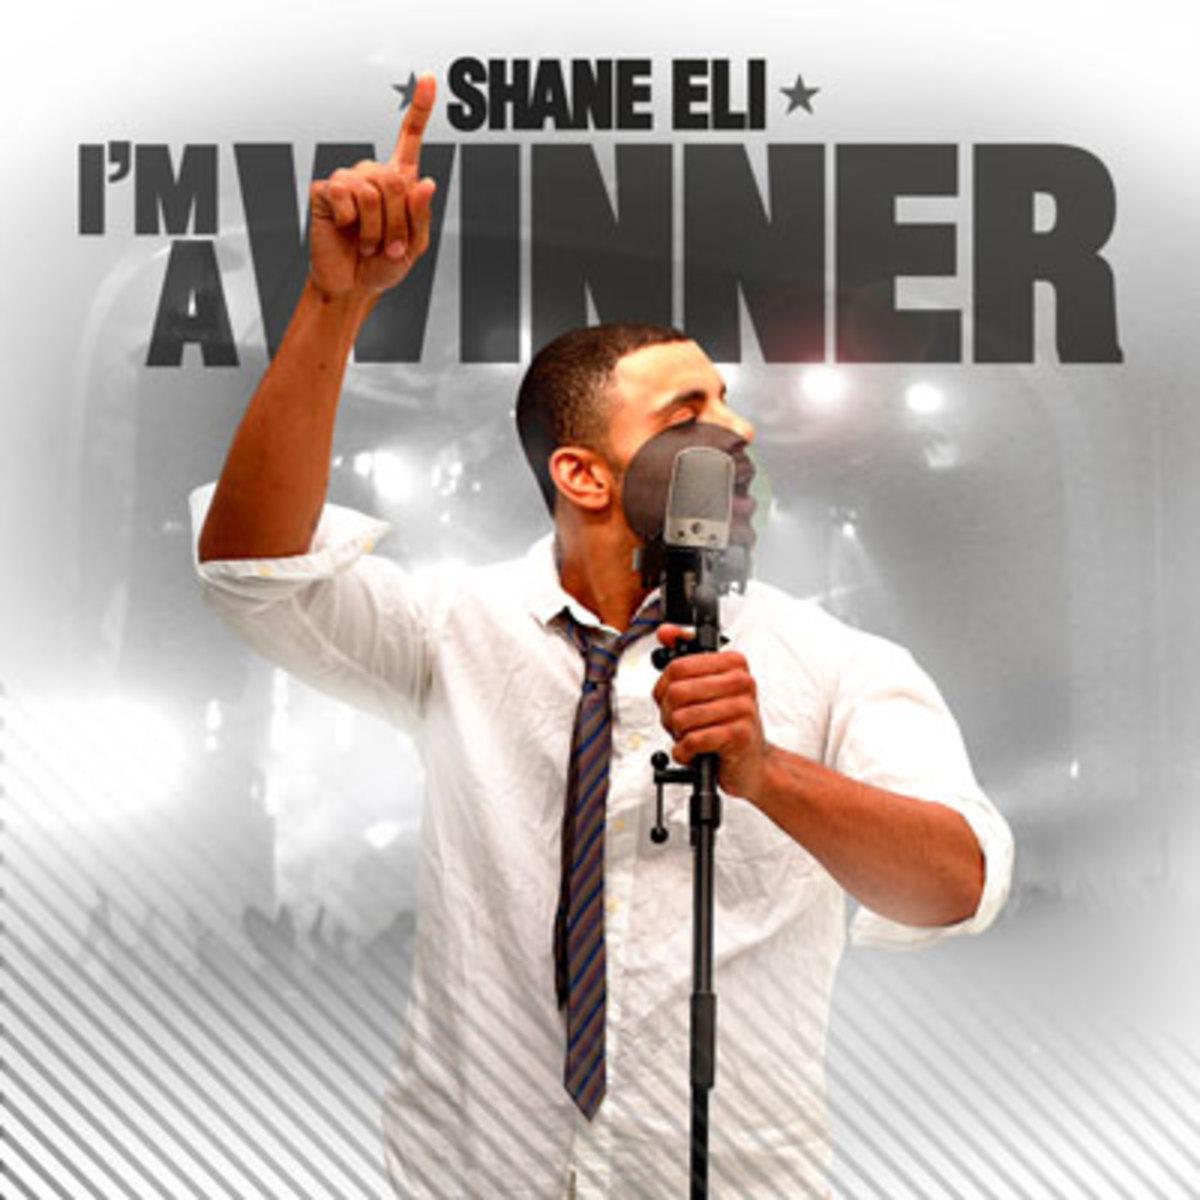 shaneeli-winner.jpg